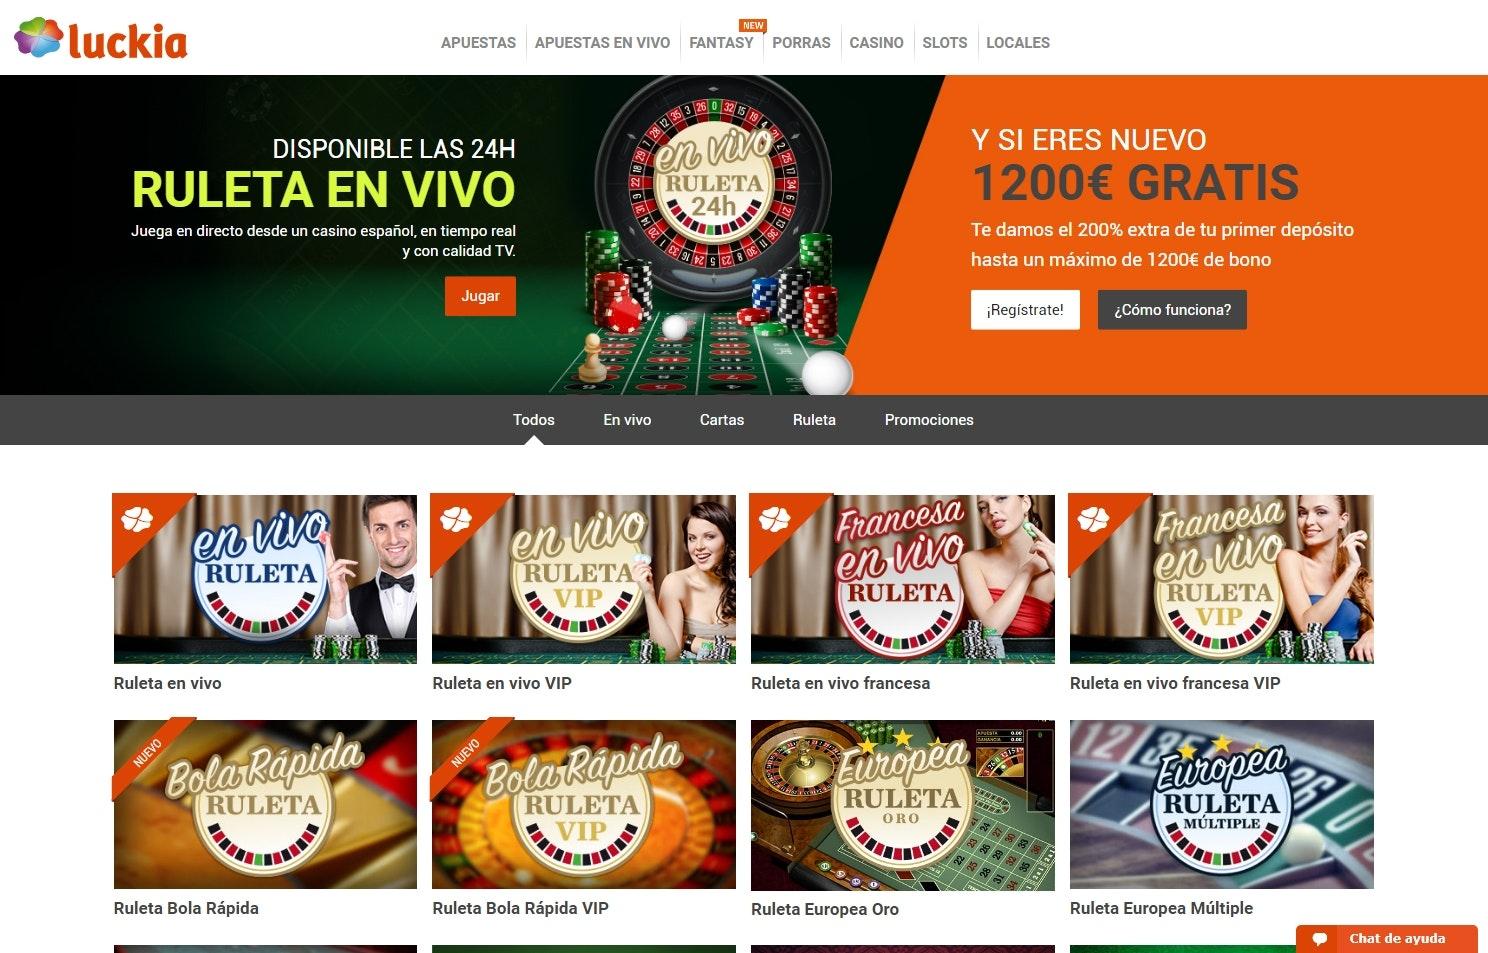 Bonos gratuit casino Austria bono gratis casa de apuestas 923619